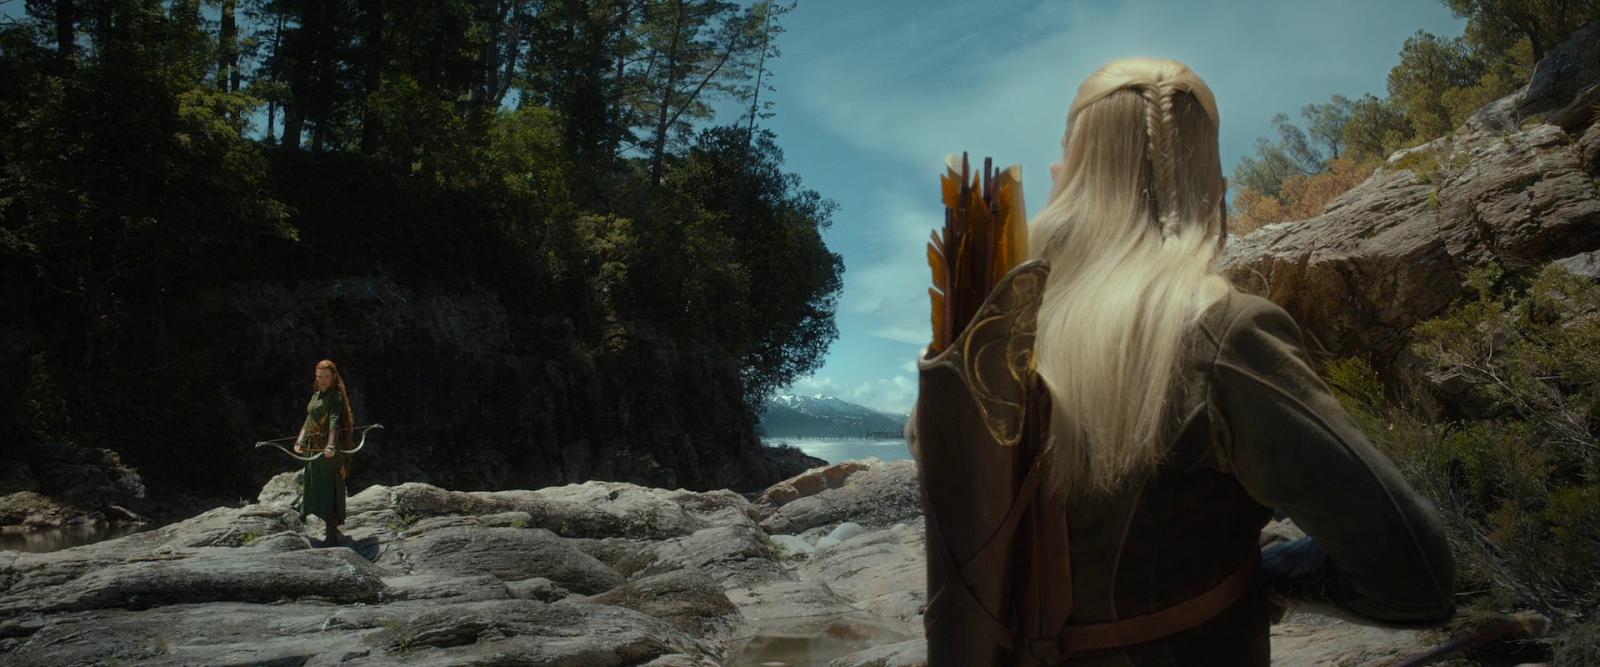 The hobbit 2 dual